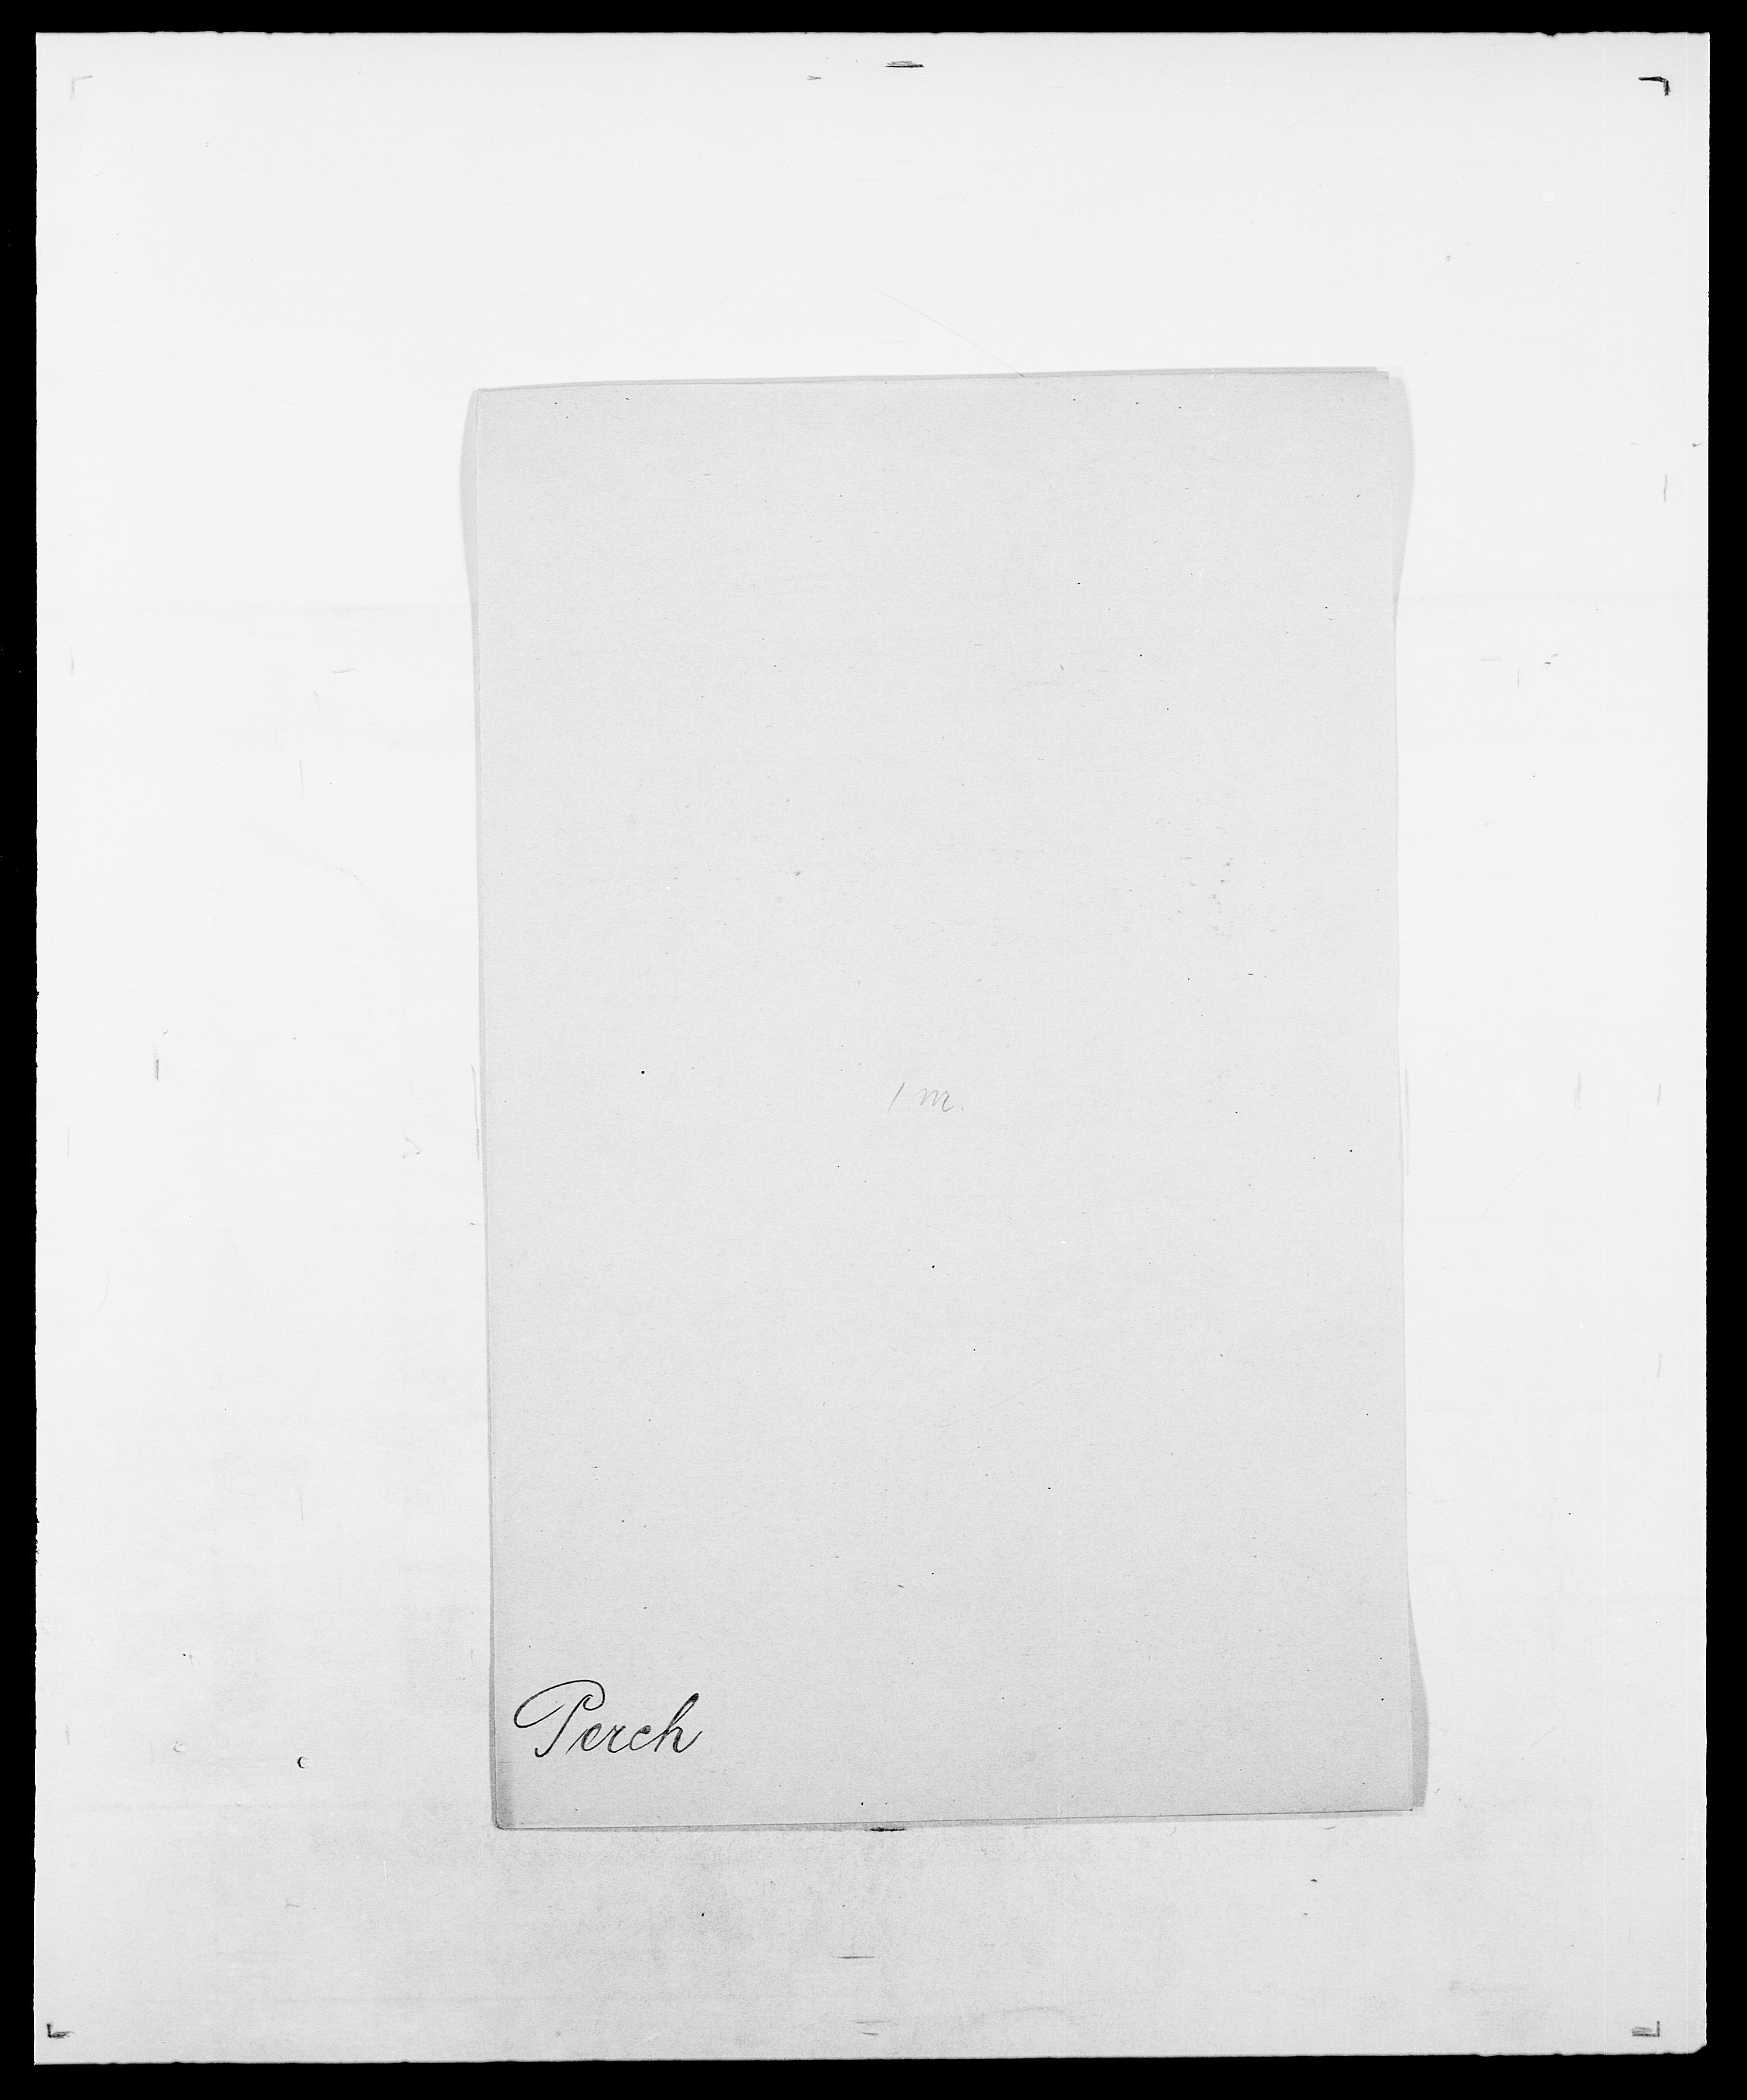 SAO, Delgobe, Charles Antoine - samling, D/Da/L0030: Paars - Pittelkov, s. 363